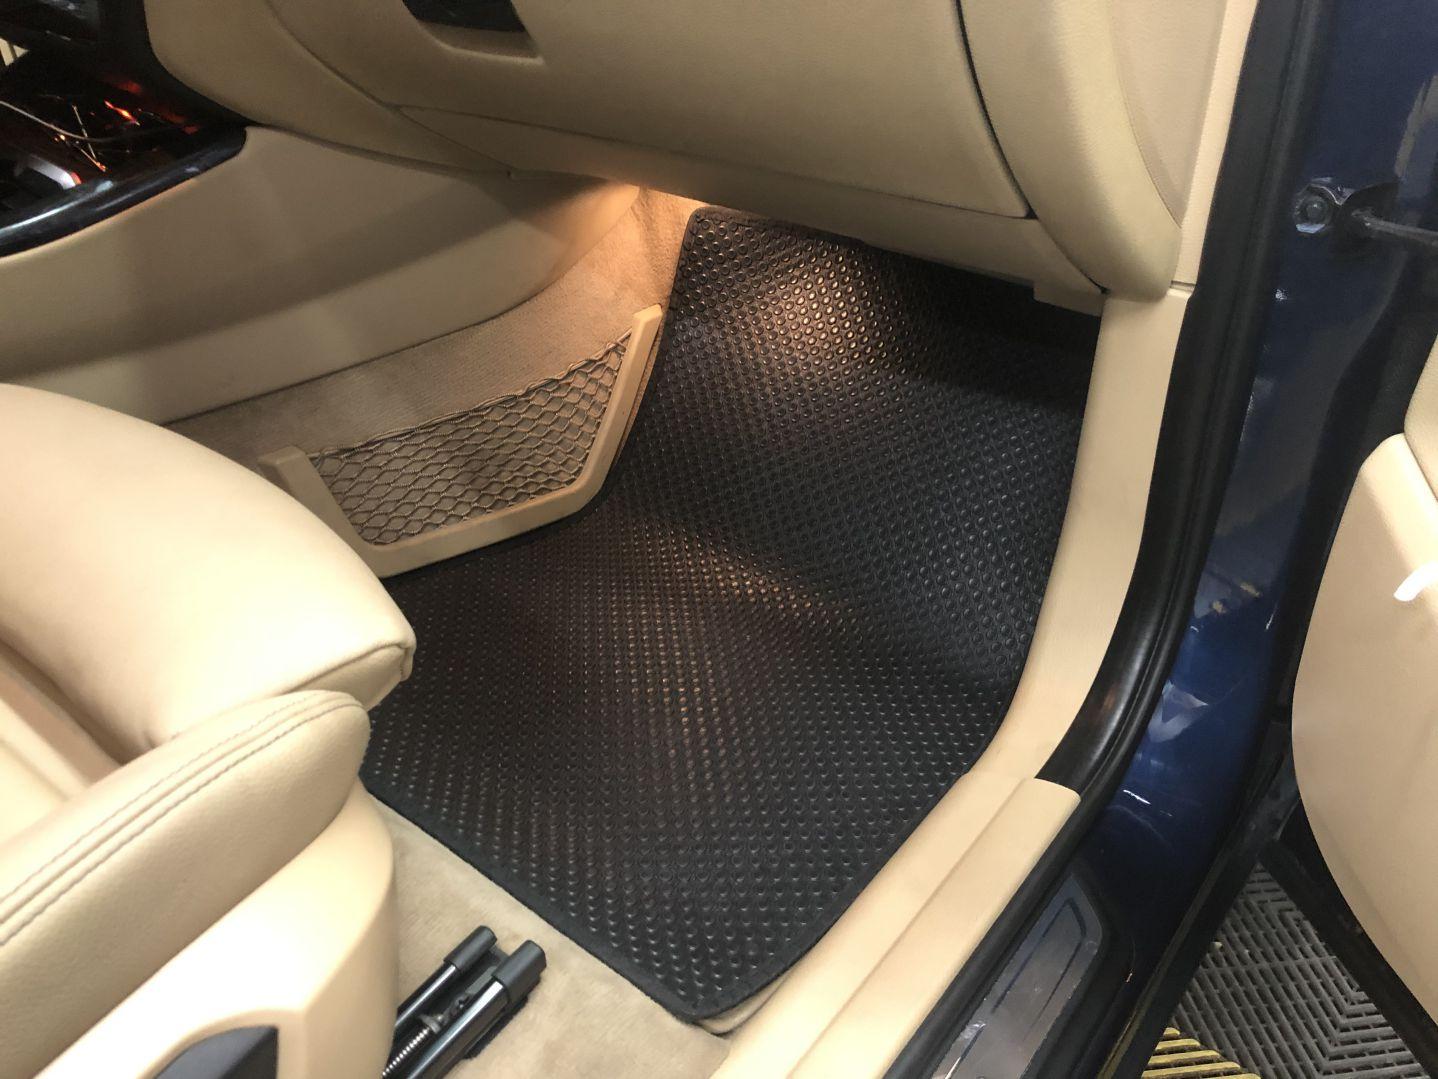 Thảm lót sàn BMW X4